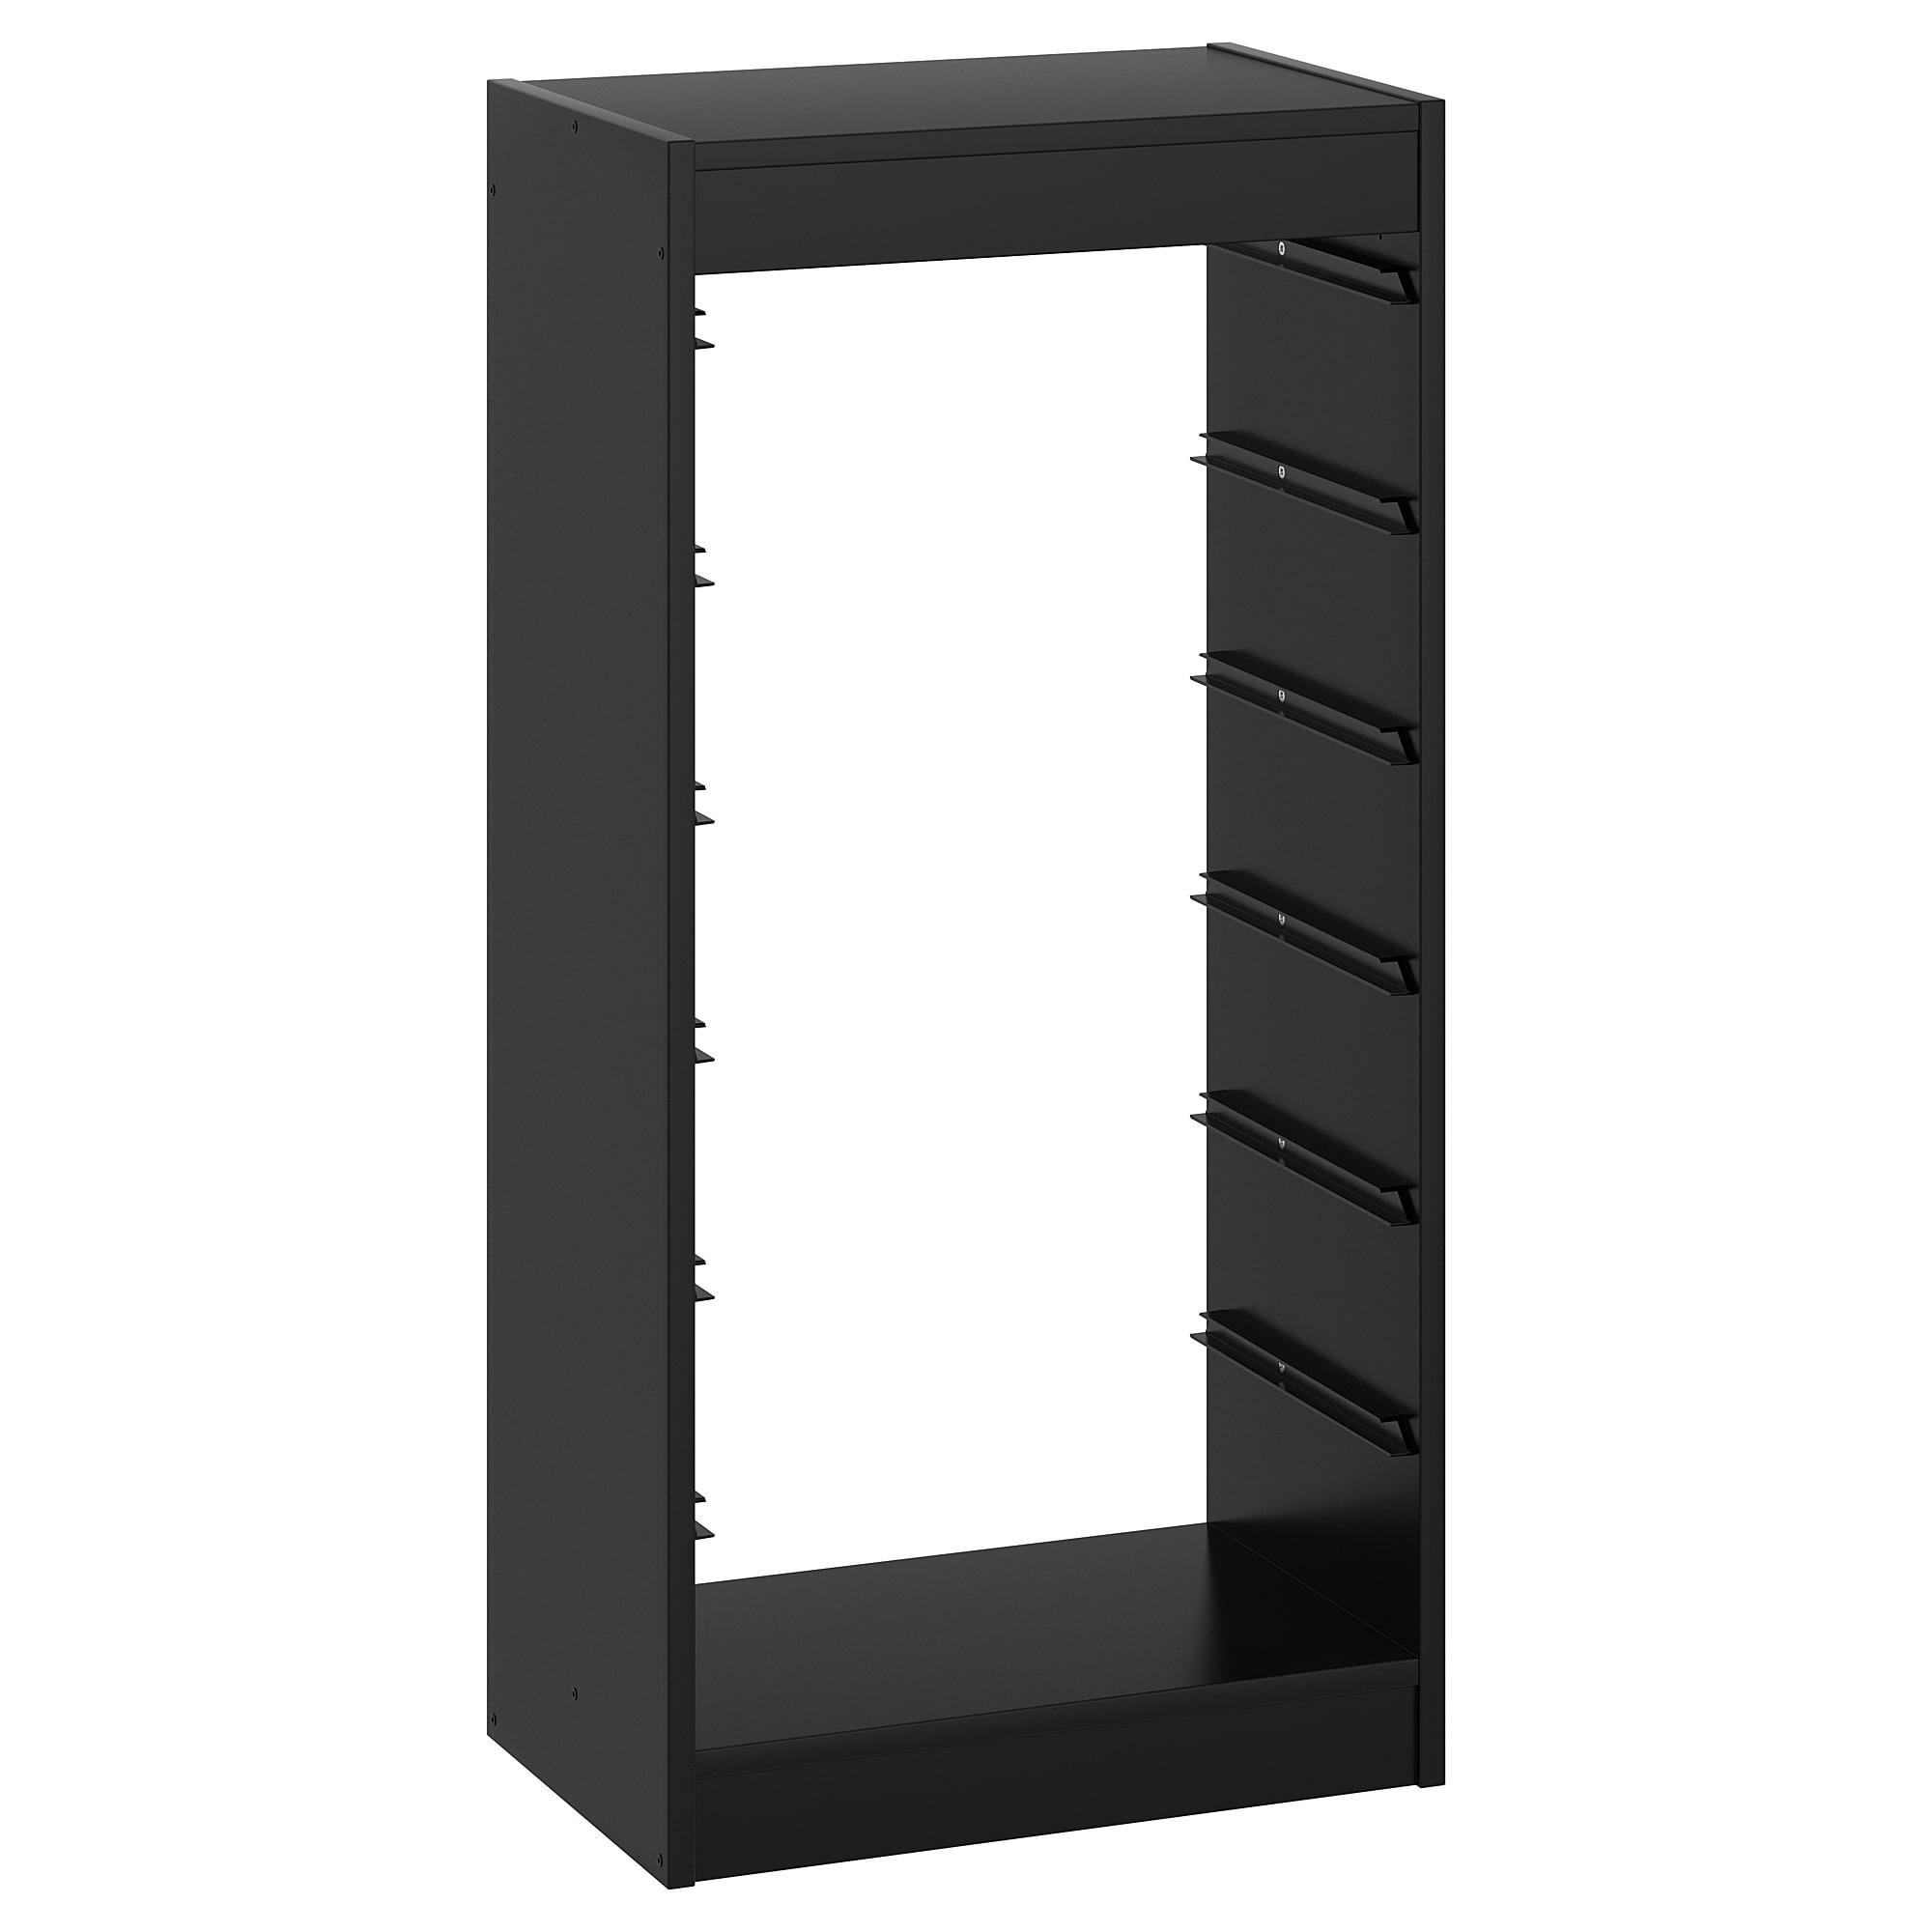 Muebles Para Bebe, Ikea Y Muebles Inside Kronqui Standard Bookcases (View 11 of 20)